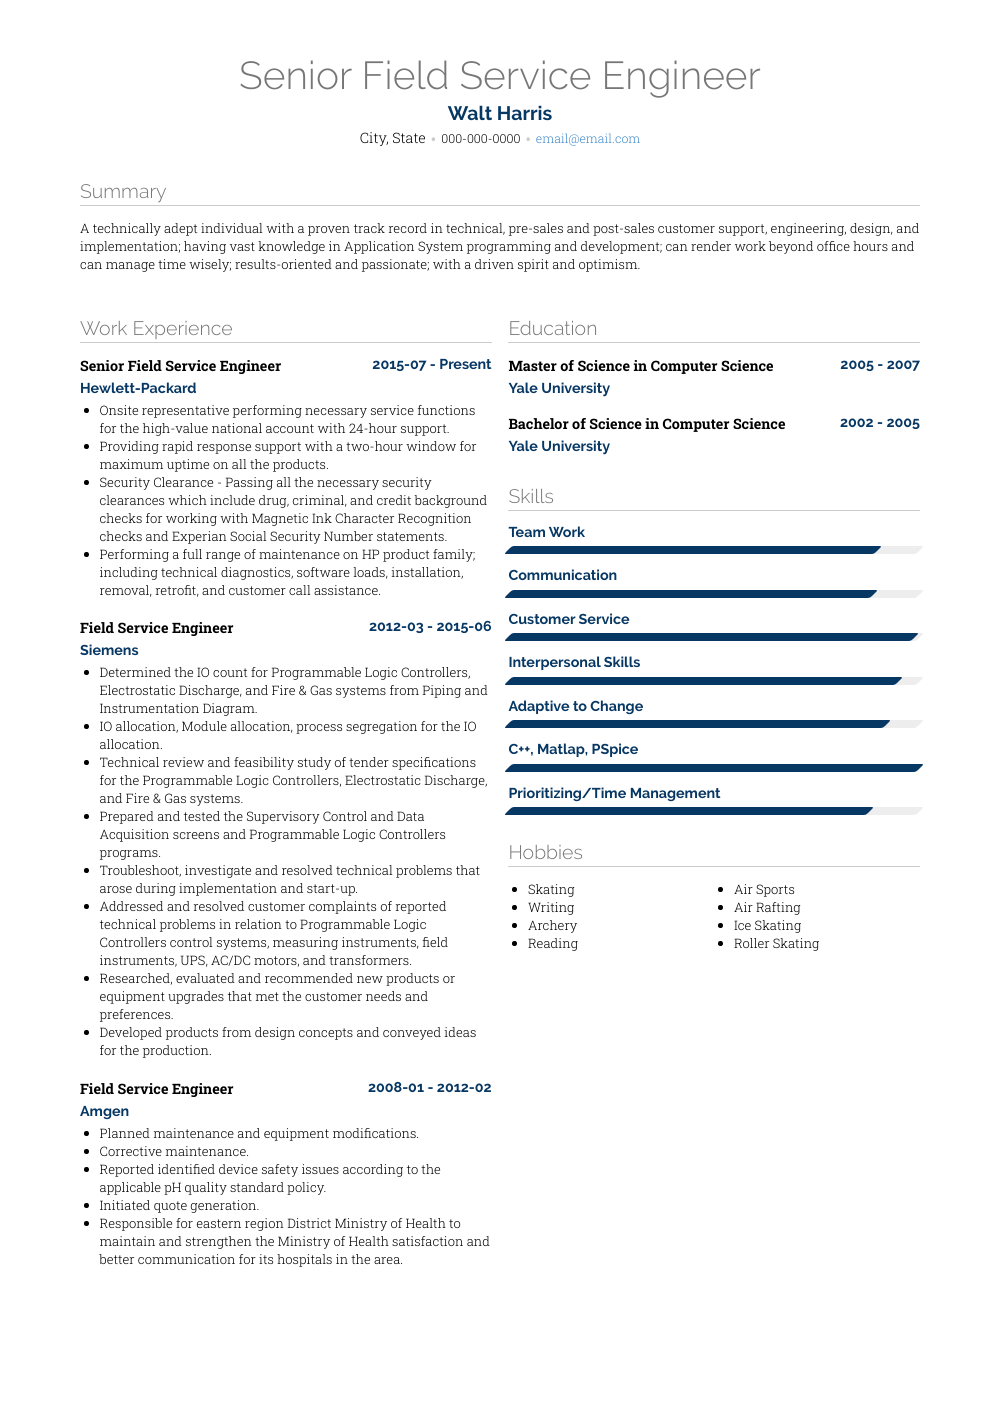 Field Service Engineer Resume Sample